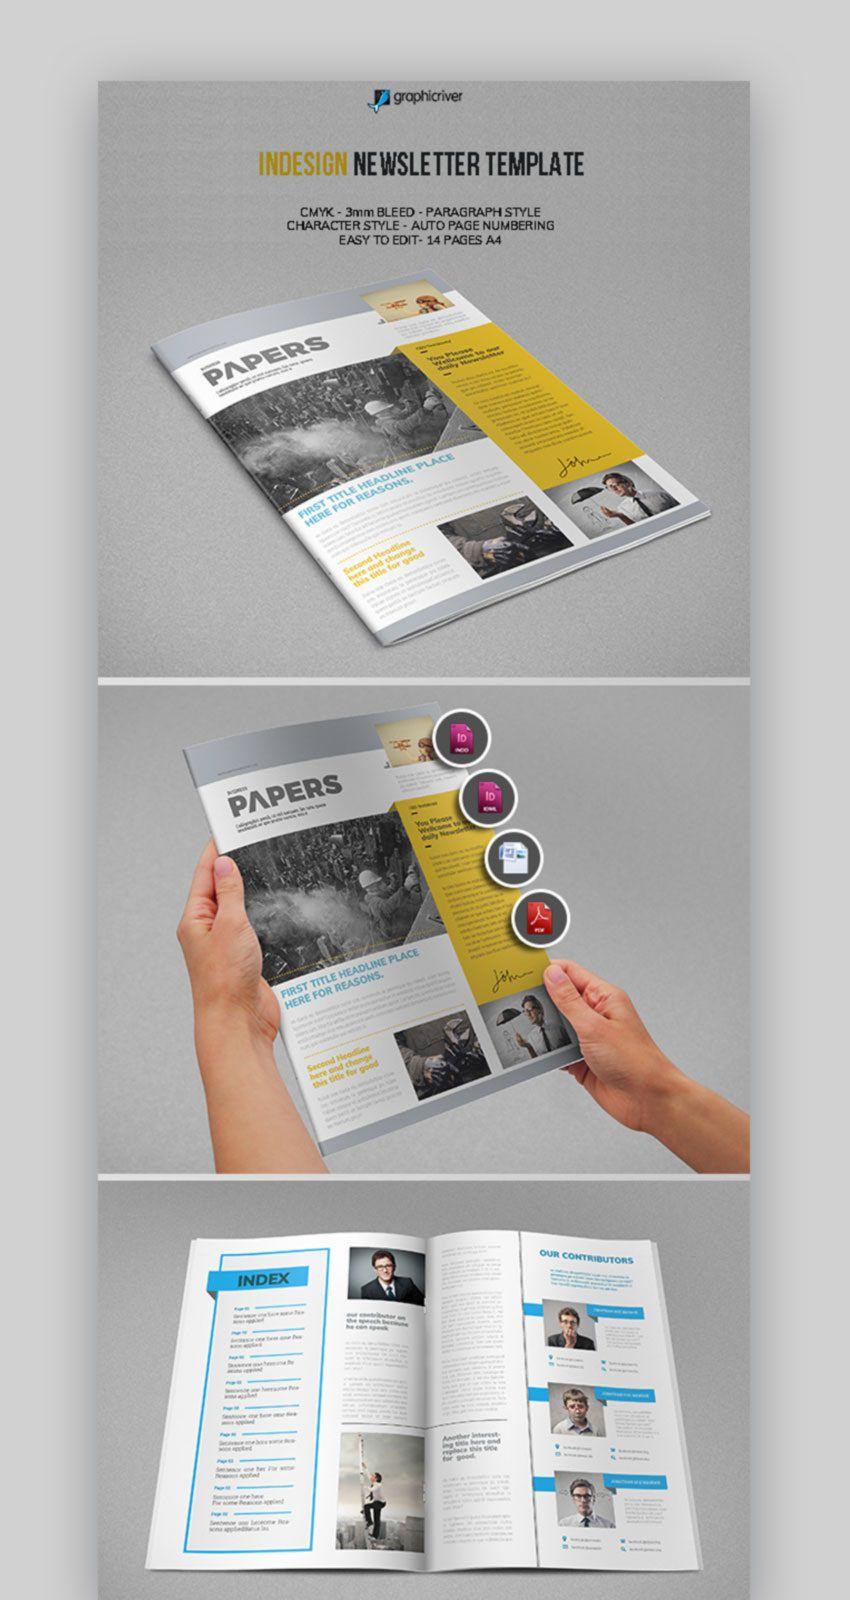 009 Beautiful Microsoft Publisher Newsletter Template Design  School Free DownloadFull